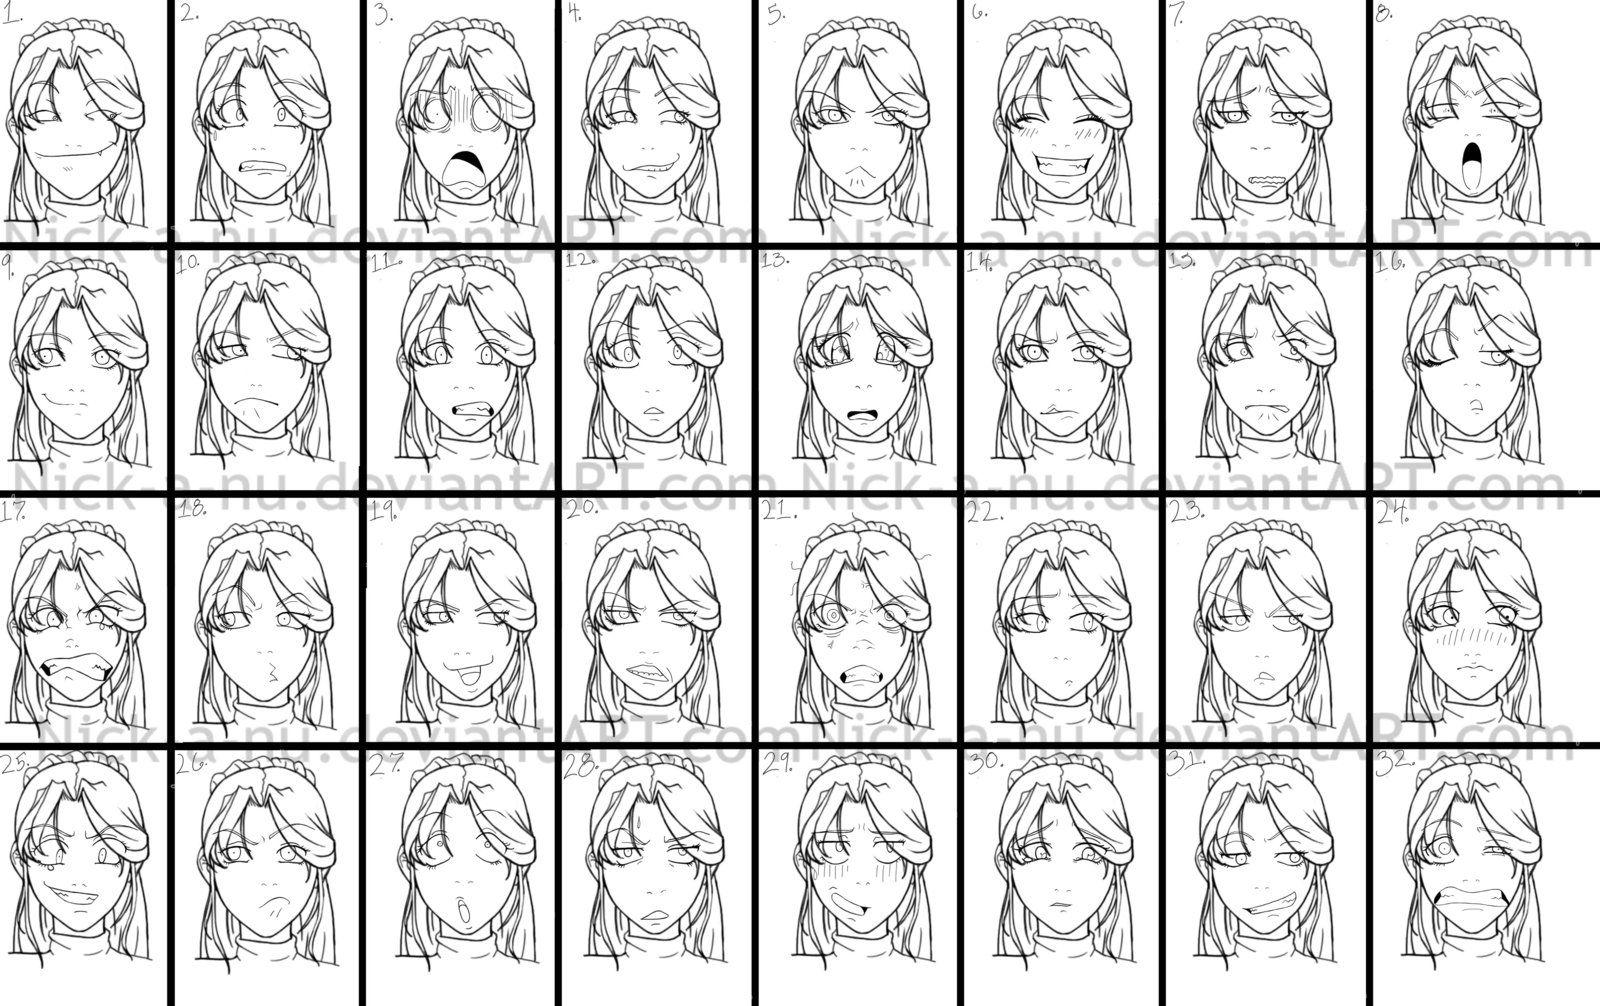 Ayla facial expressions by nickanu on deviantART